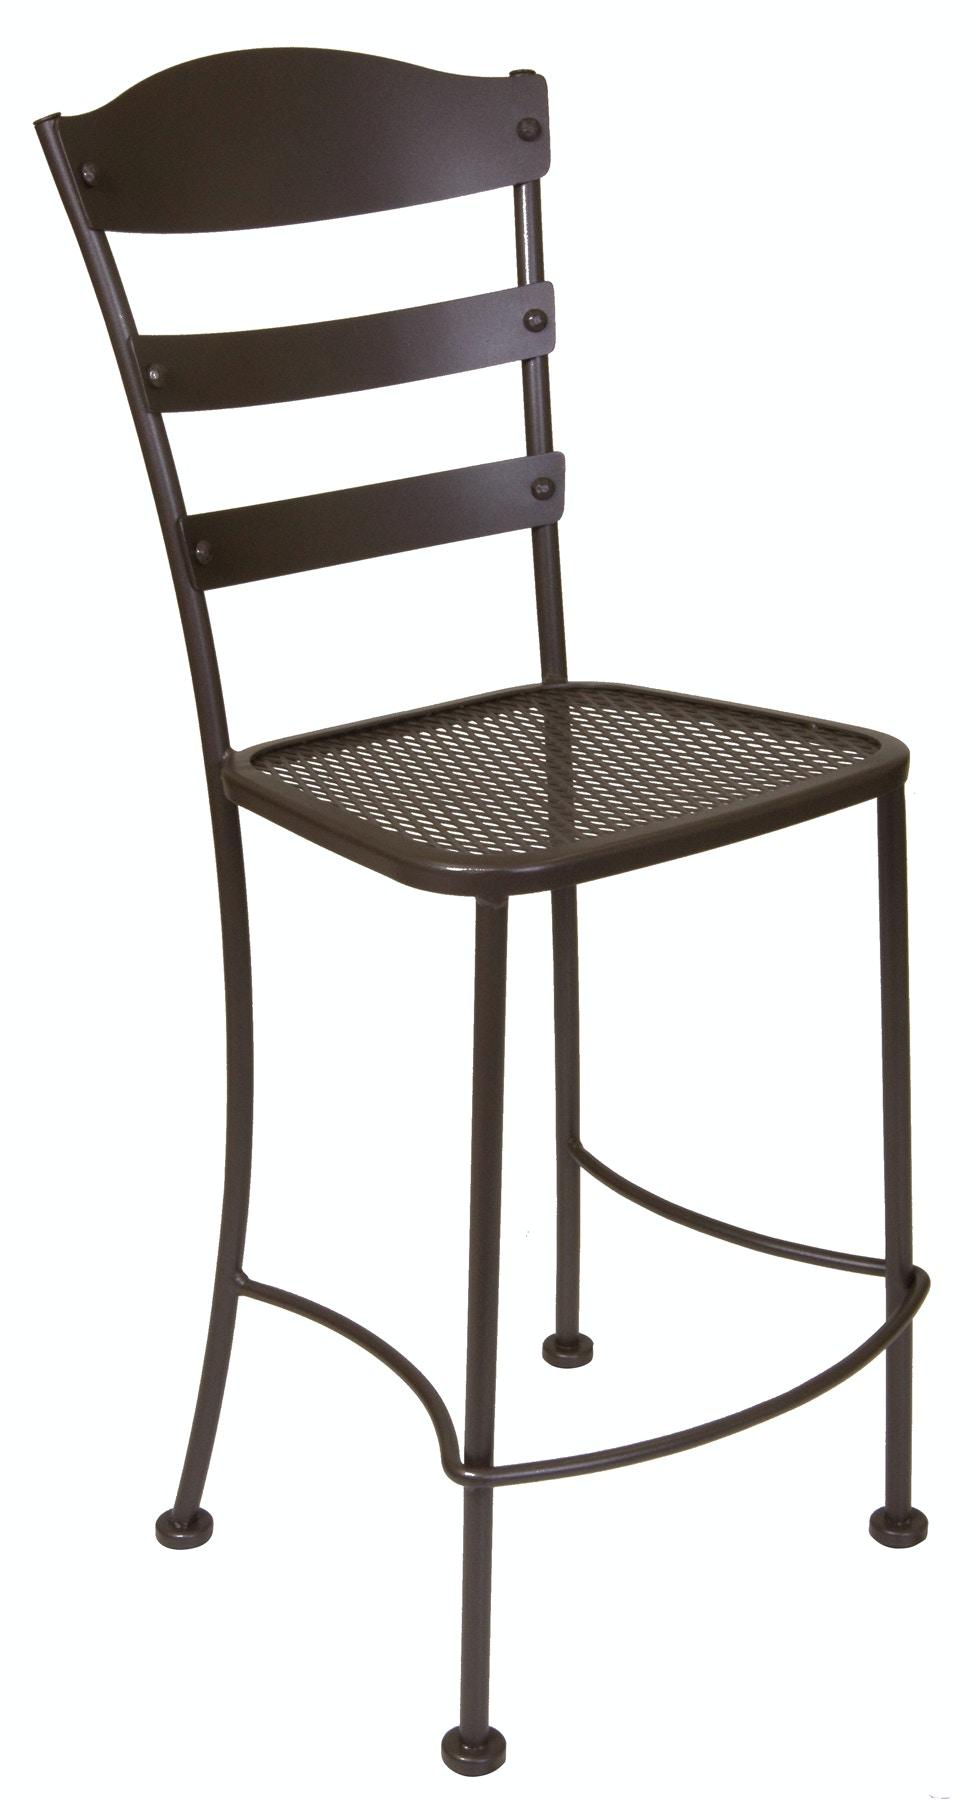 OW Lee Furniture Chalet Bar Stool 616 BS